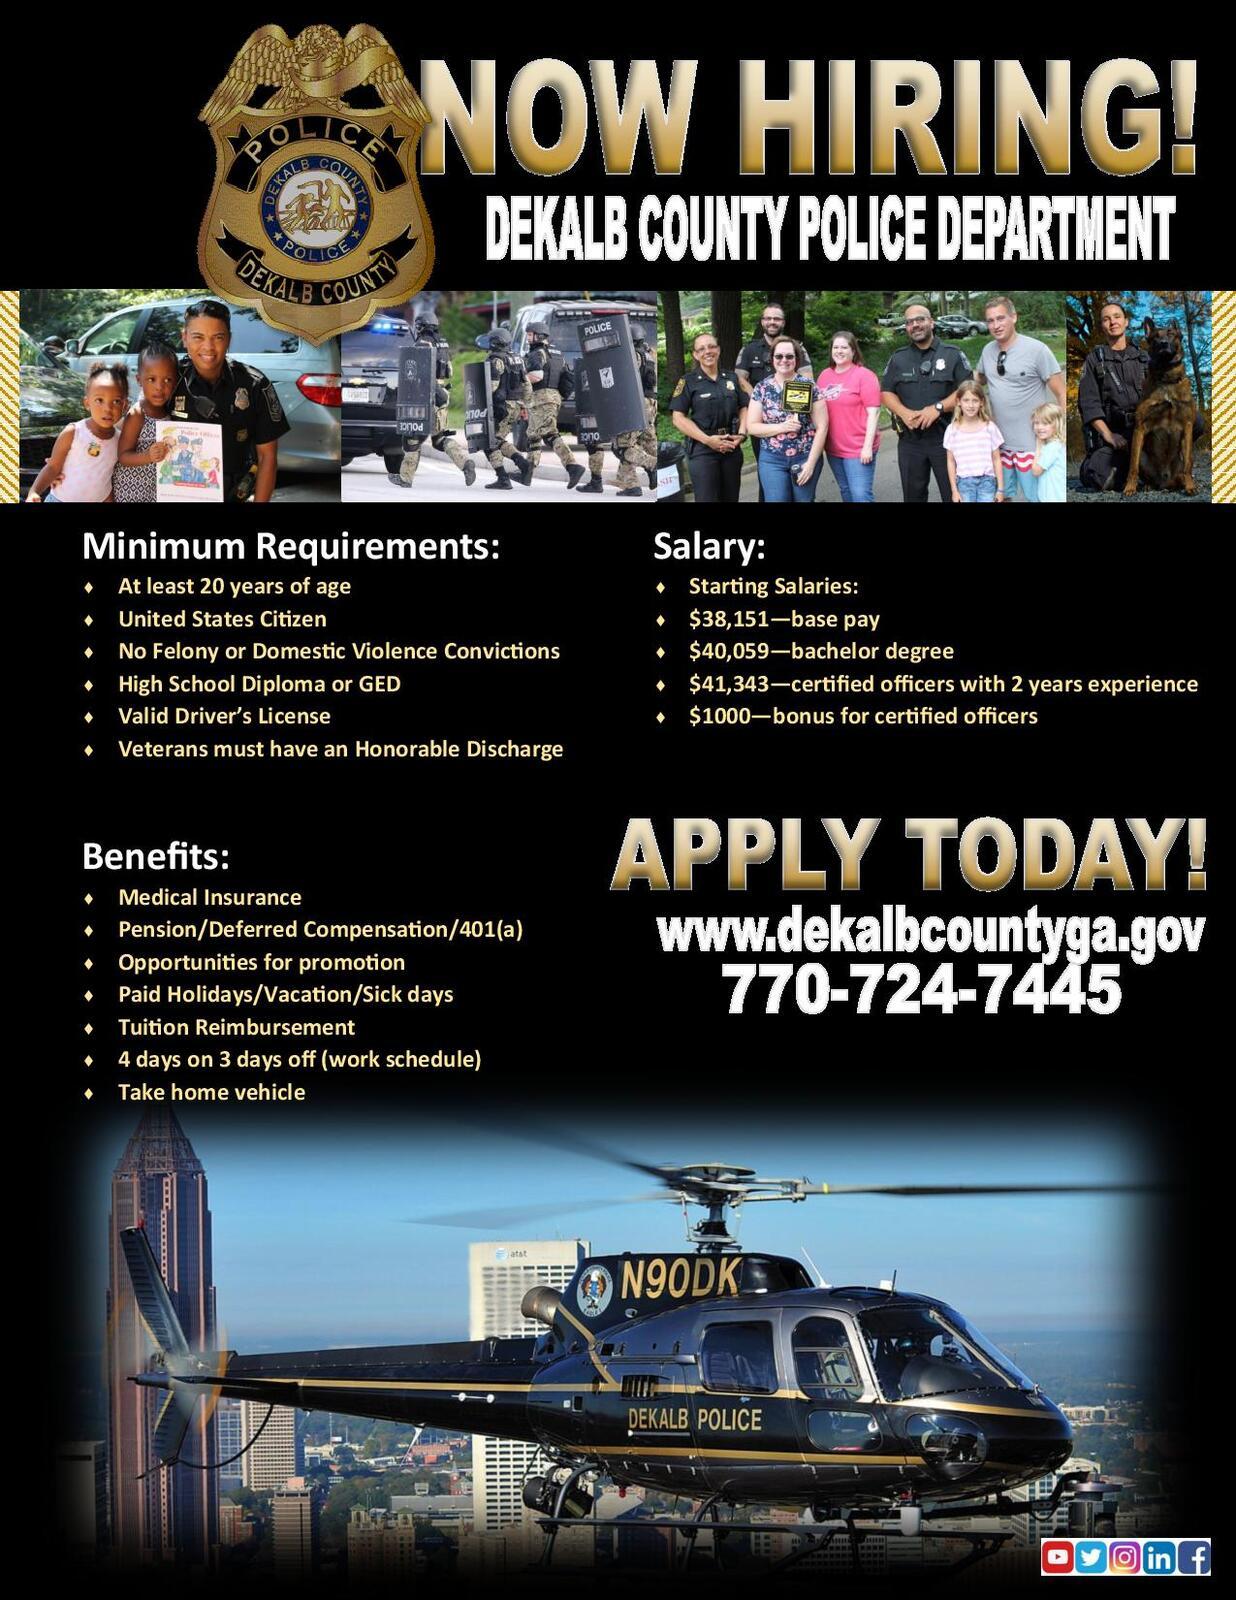 Now Hiring - DeKalb County Police Department (DeKalb County Police  Department)   Nextdoor